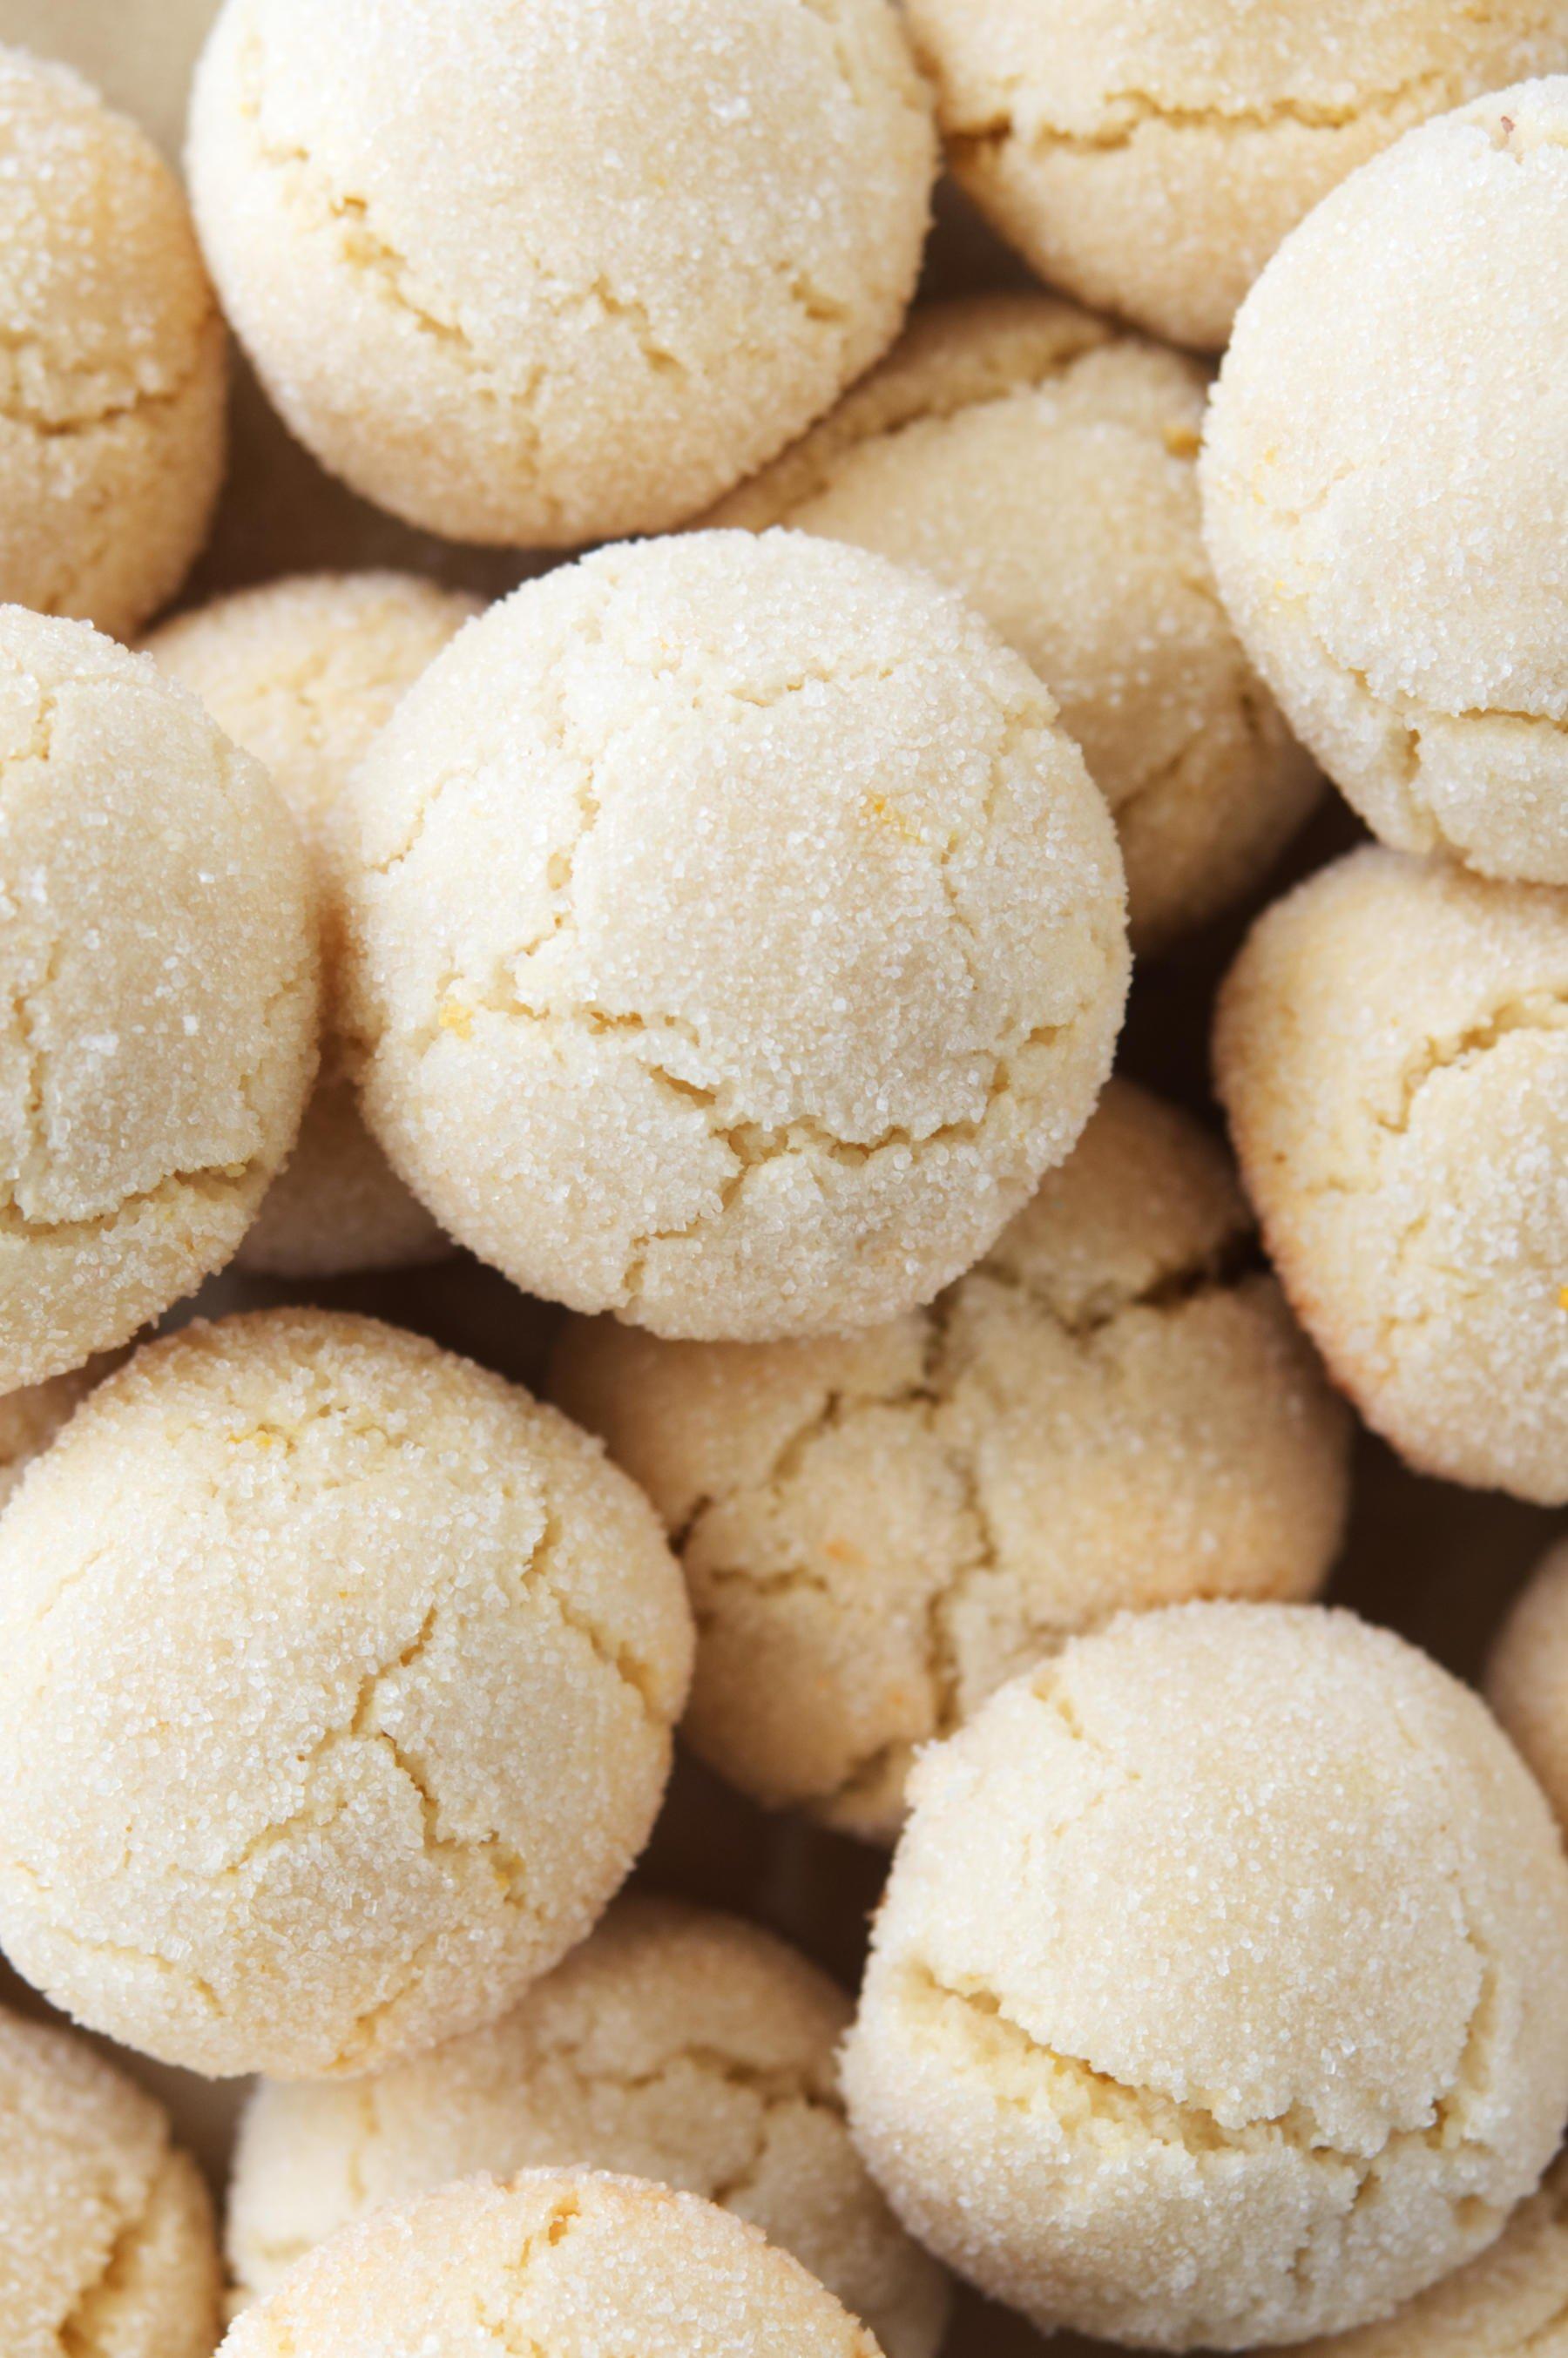 Close-up of a pile of Italian Amaretti Cookies